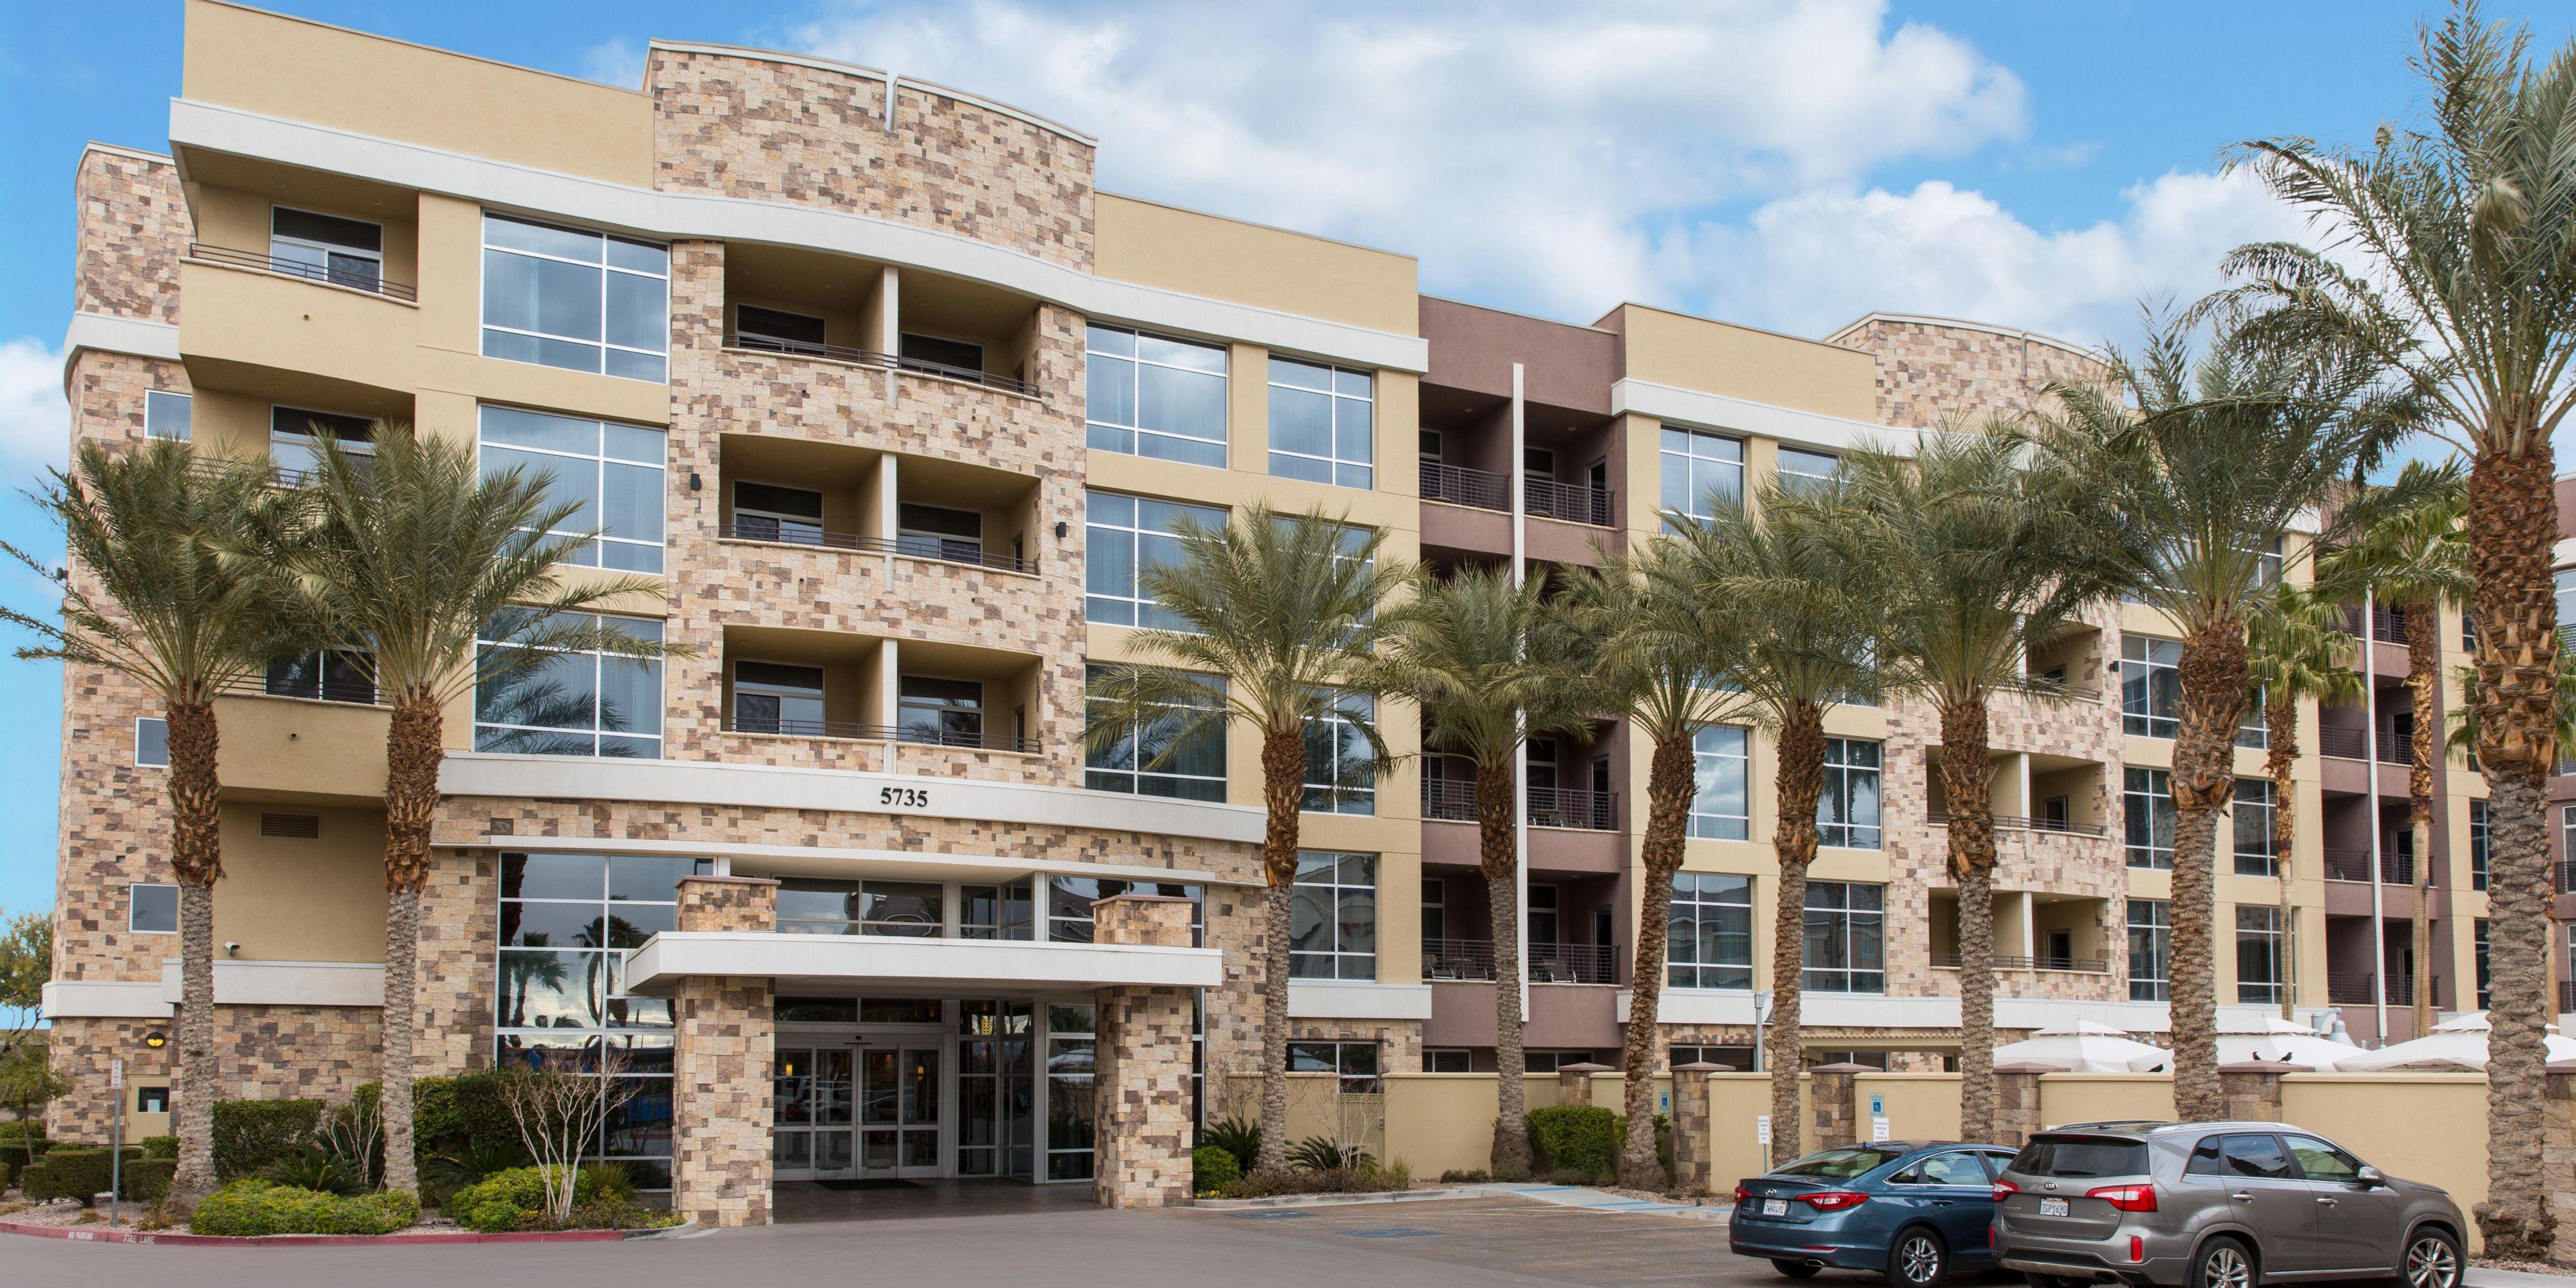 AARP/Senior Participating Hotels & Resorts